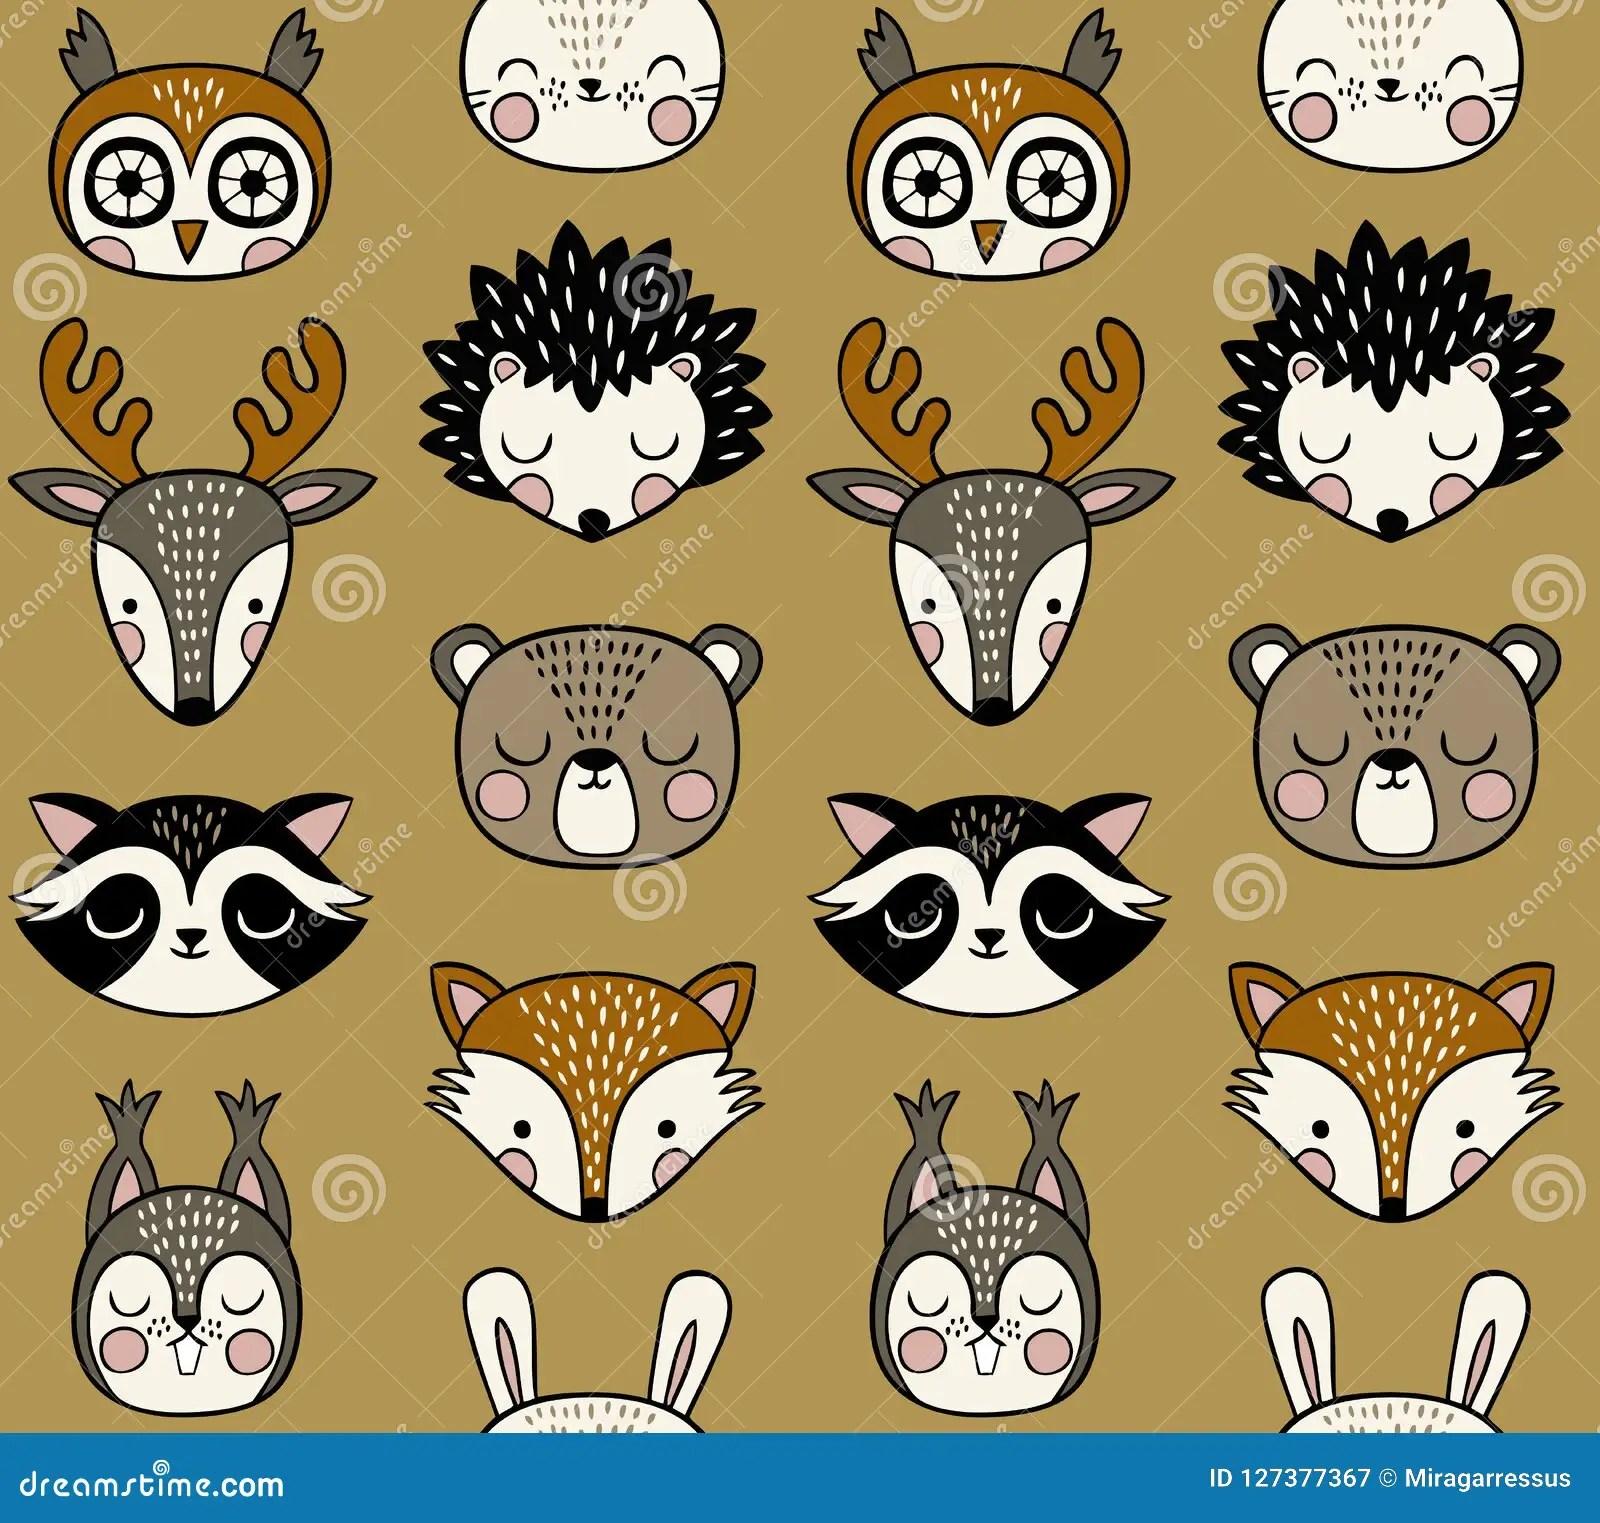 cute woodland animal heads